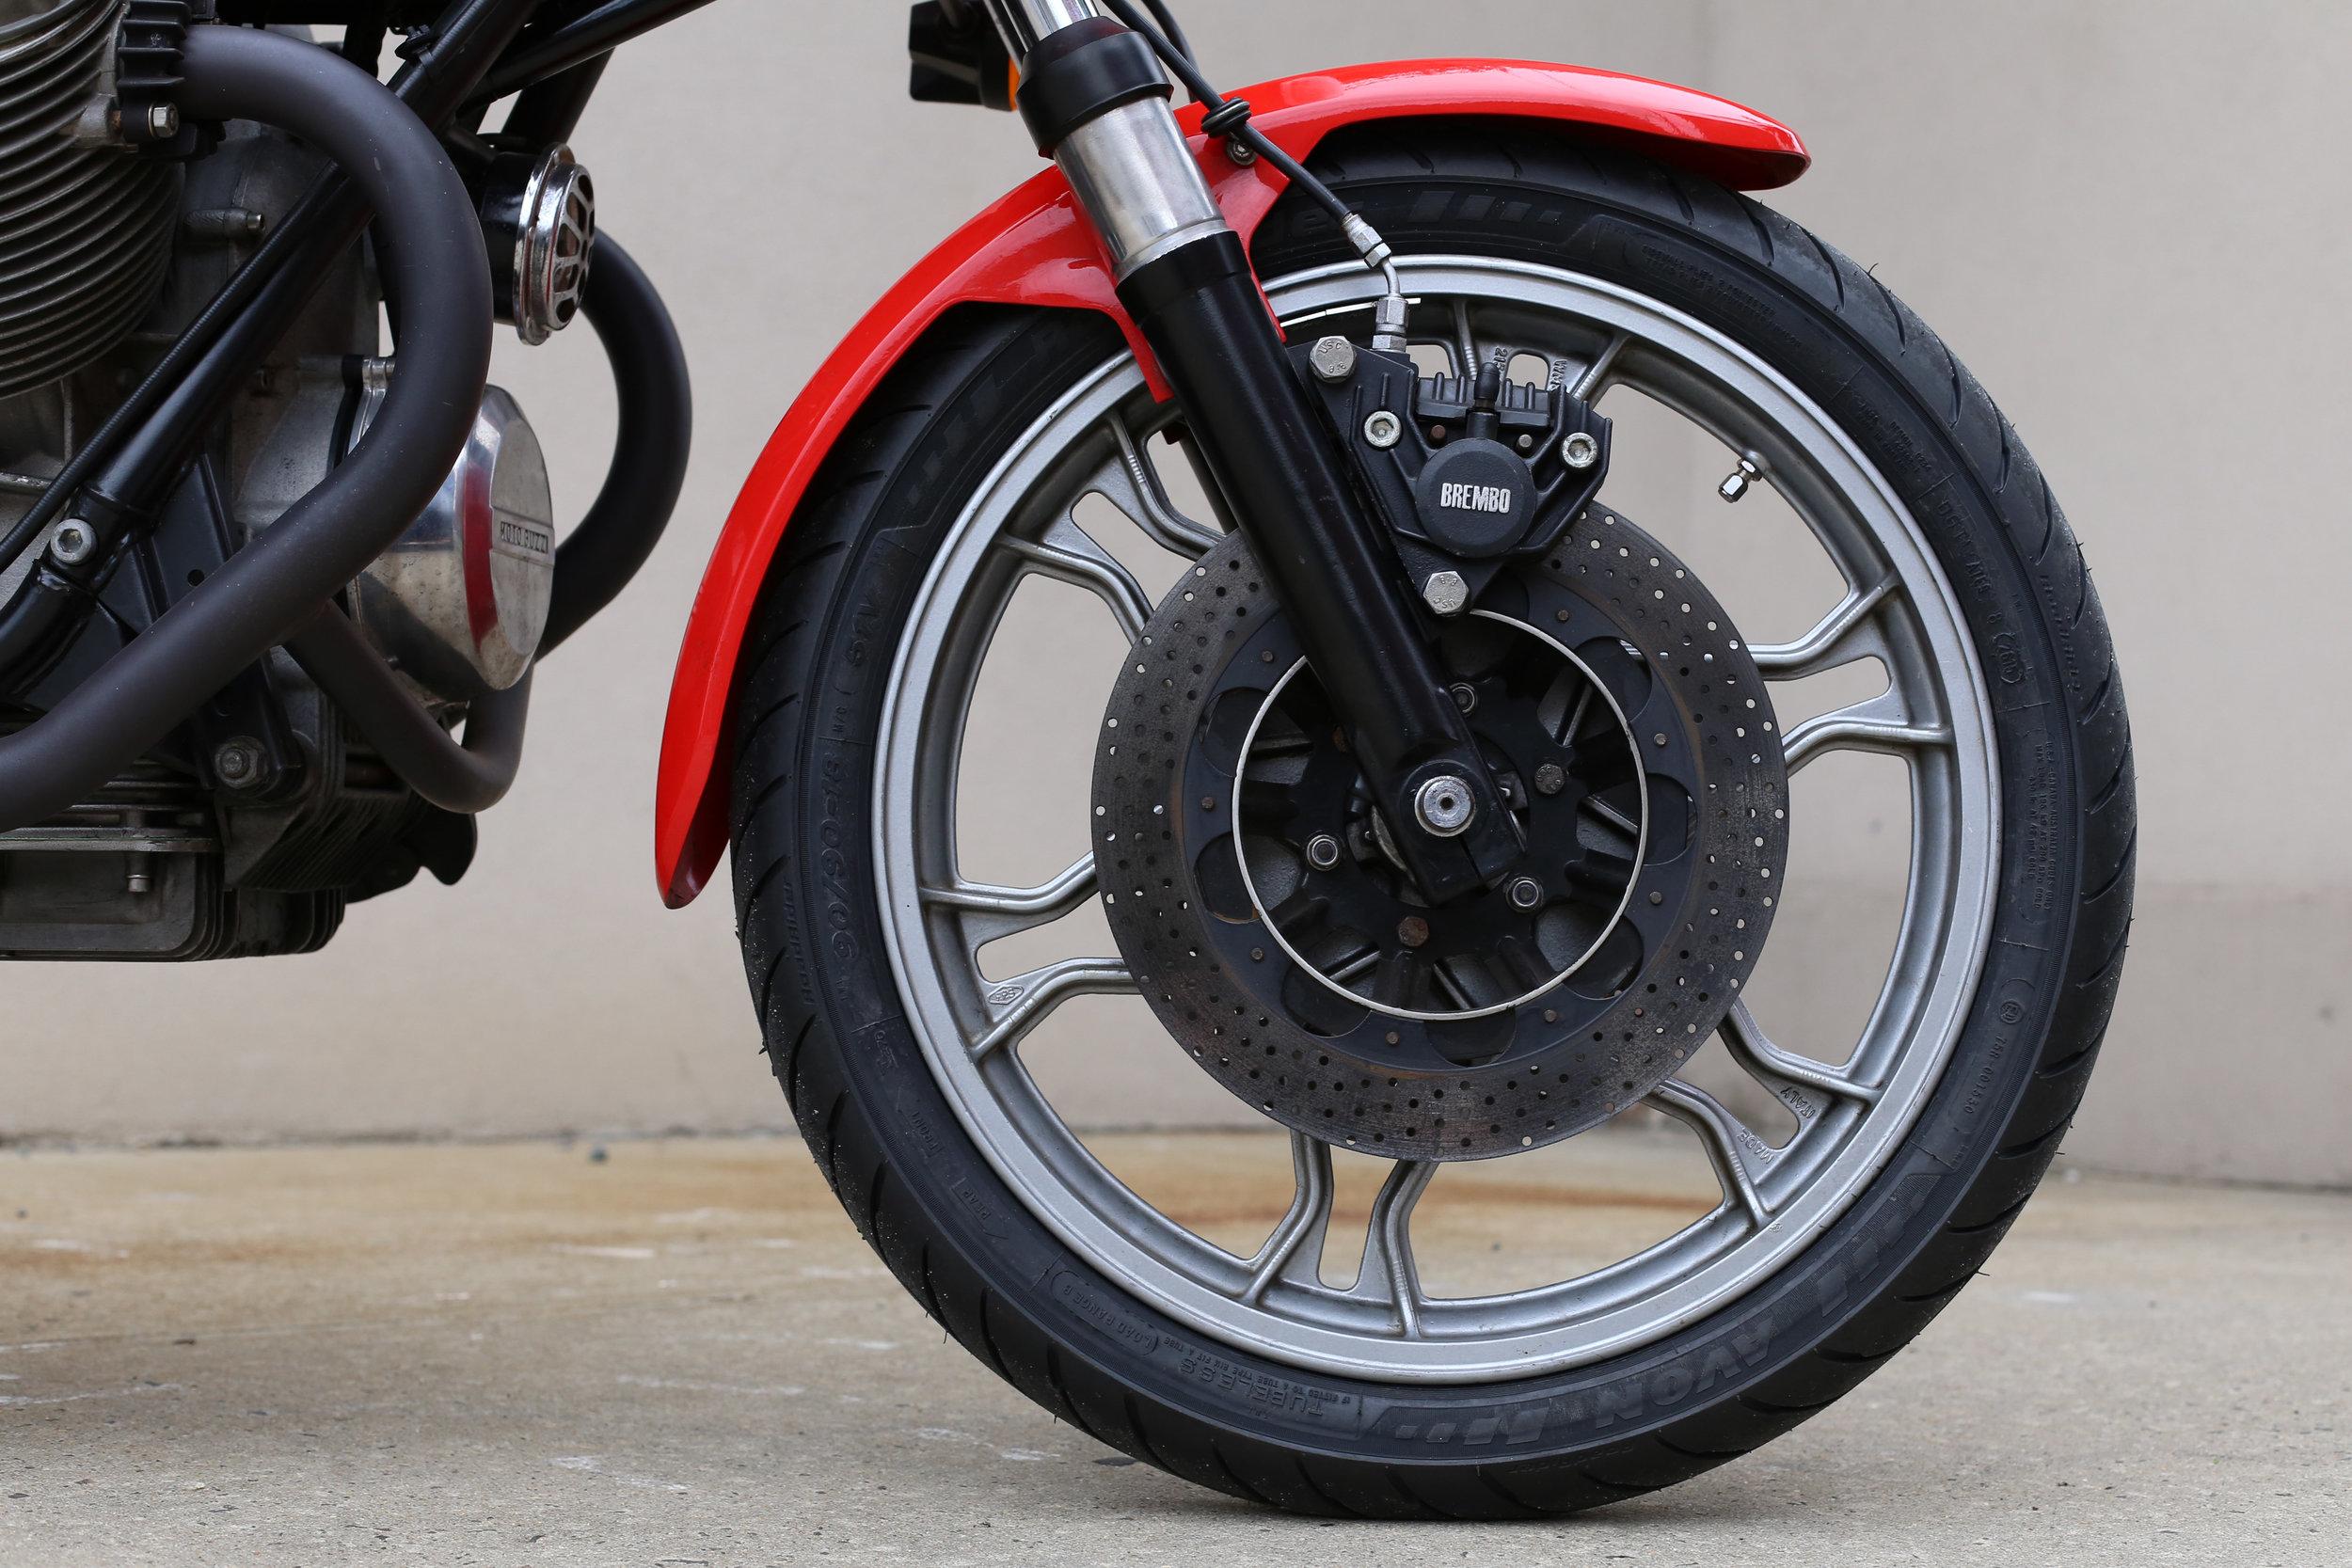 1977 Moto Guzzi Lemans 1 Front Wheel